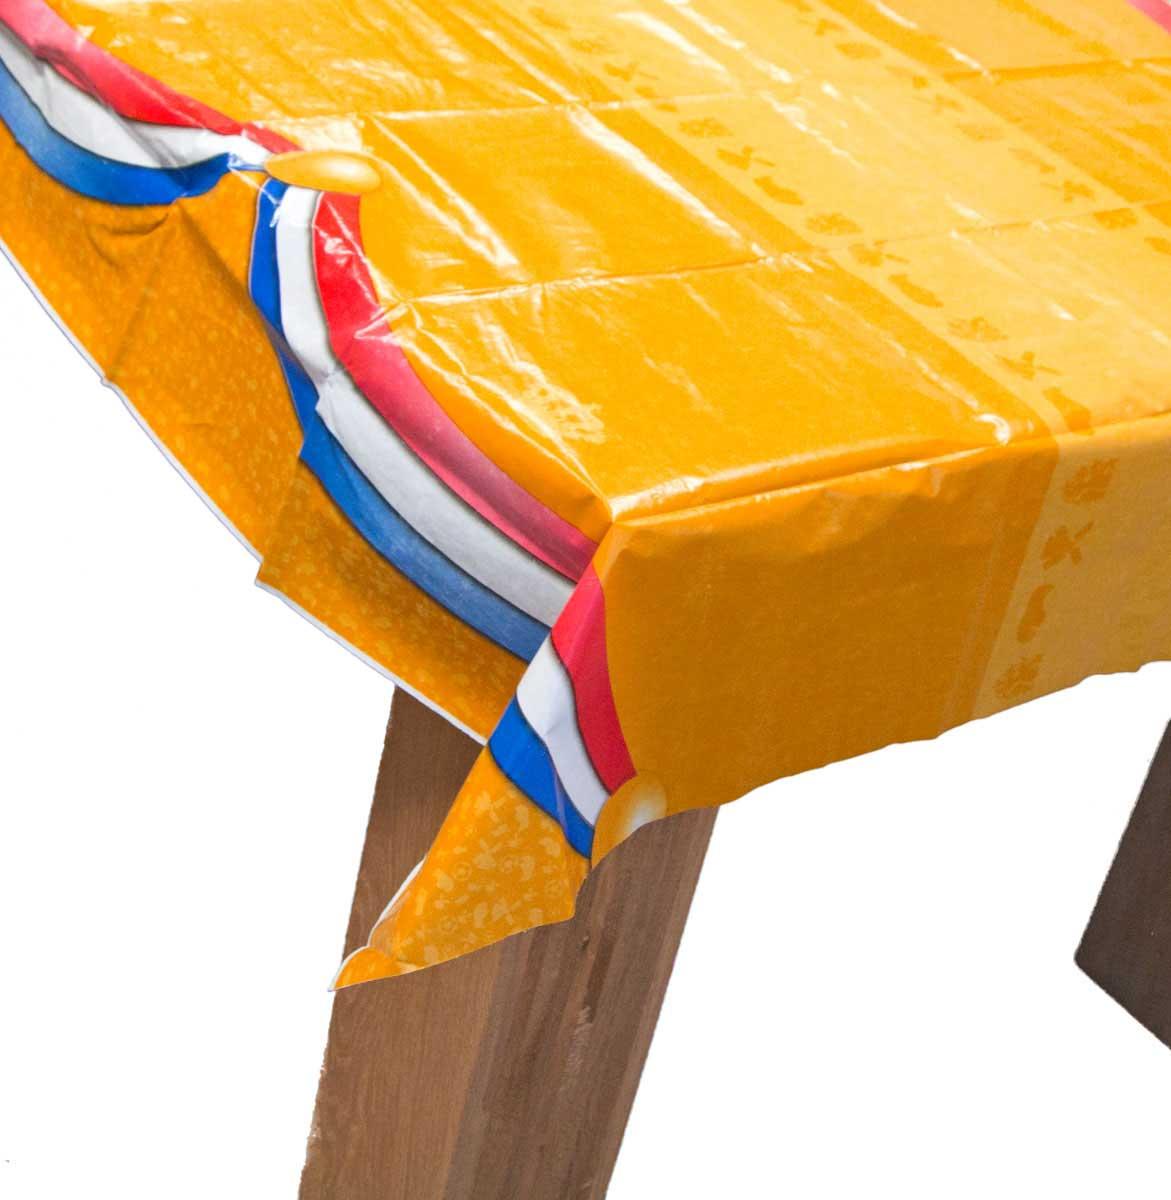 Oranje Tafelkleed met Nederlanse Vlag 180x130cm